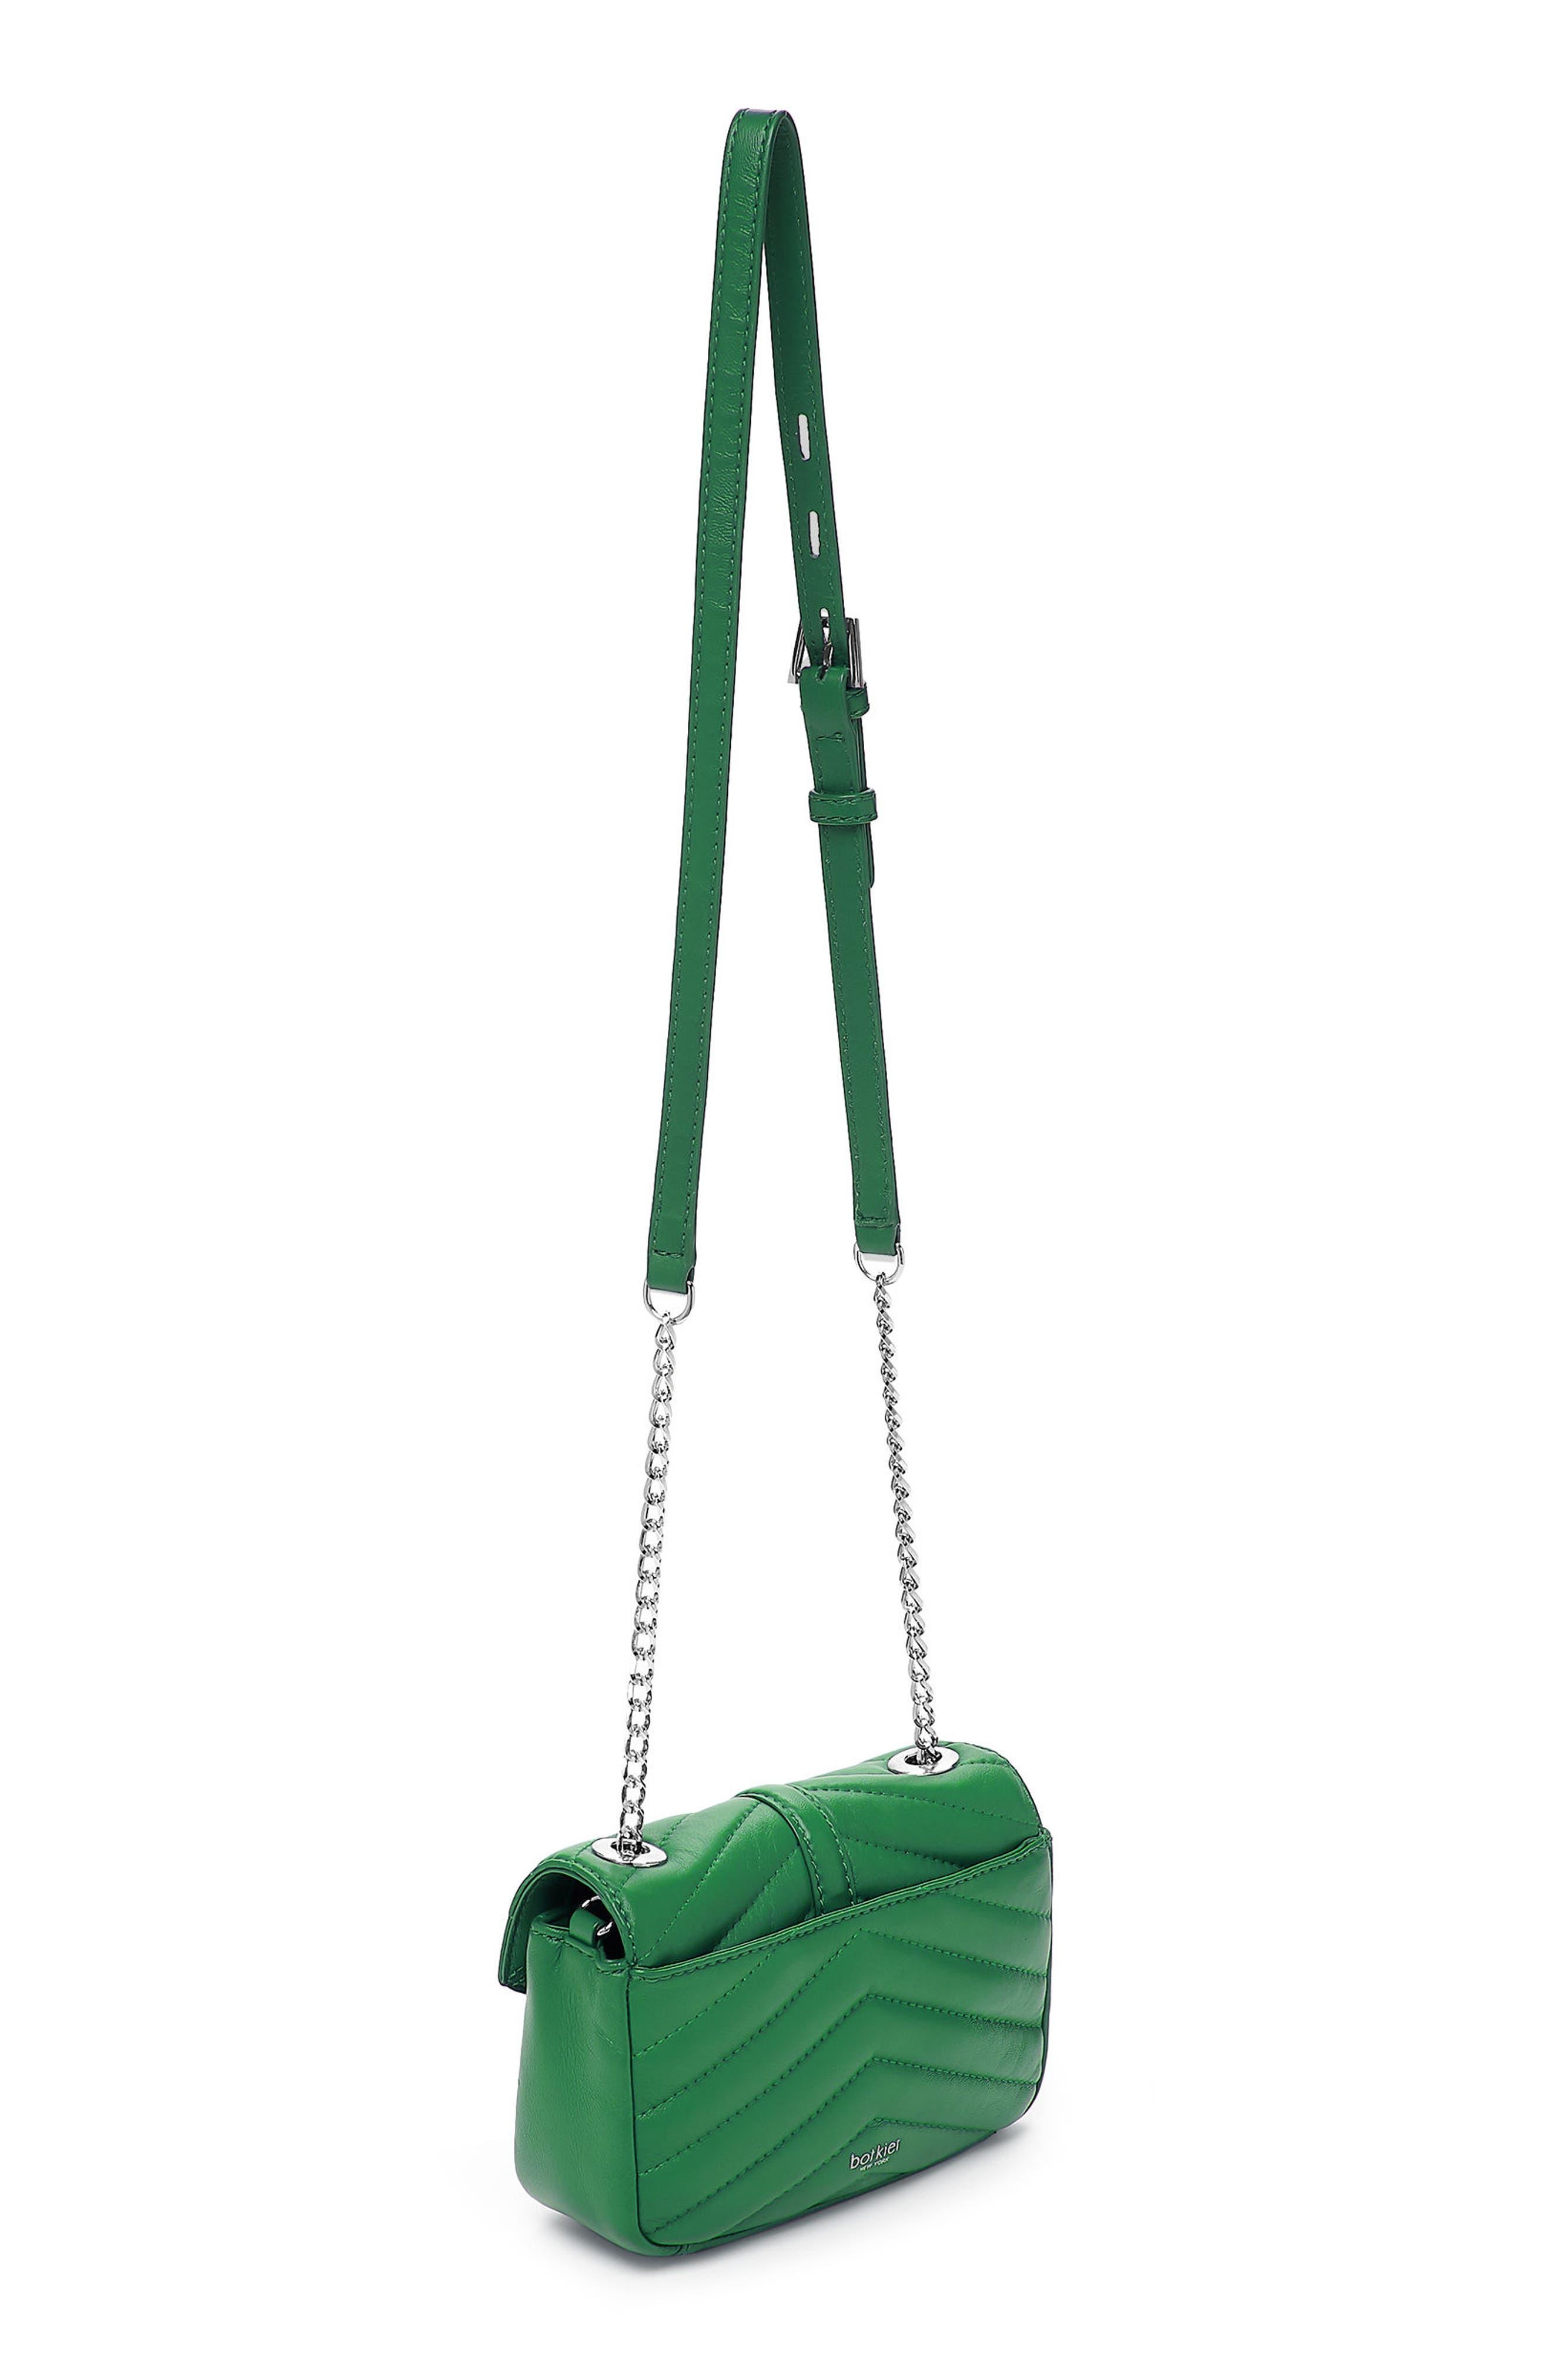 Dakota Quilted Leather Crossbody Bag,                             Alternate thumbnail 4, color,                             GREEN